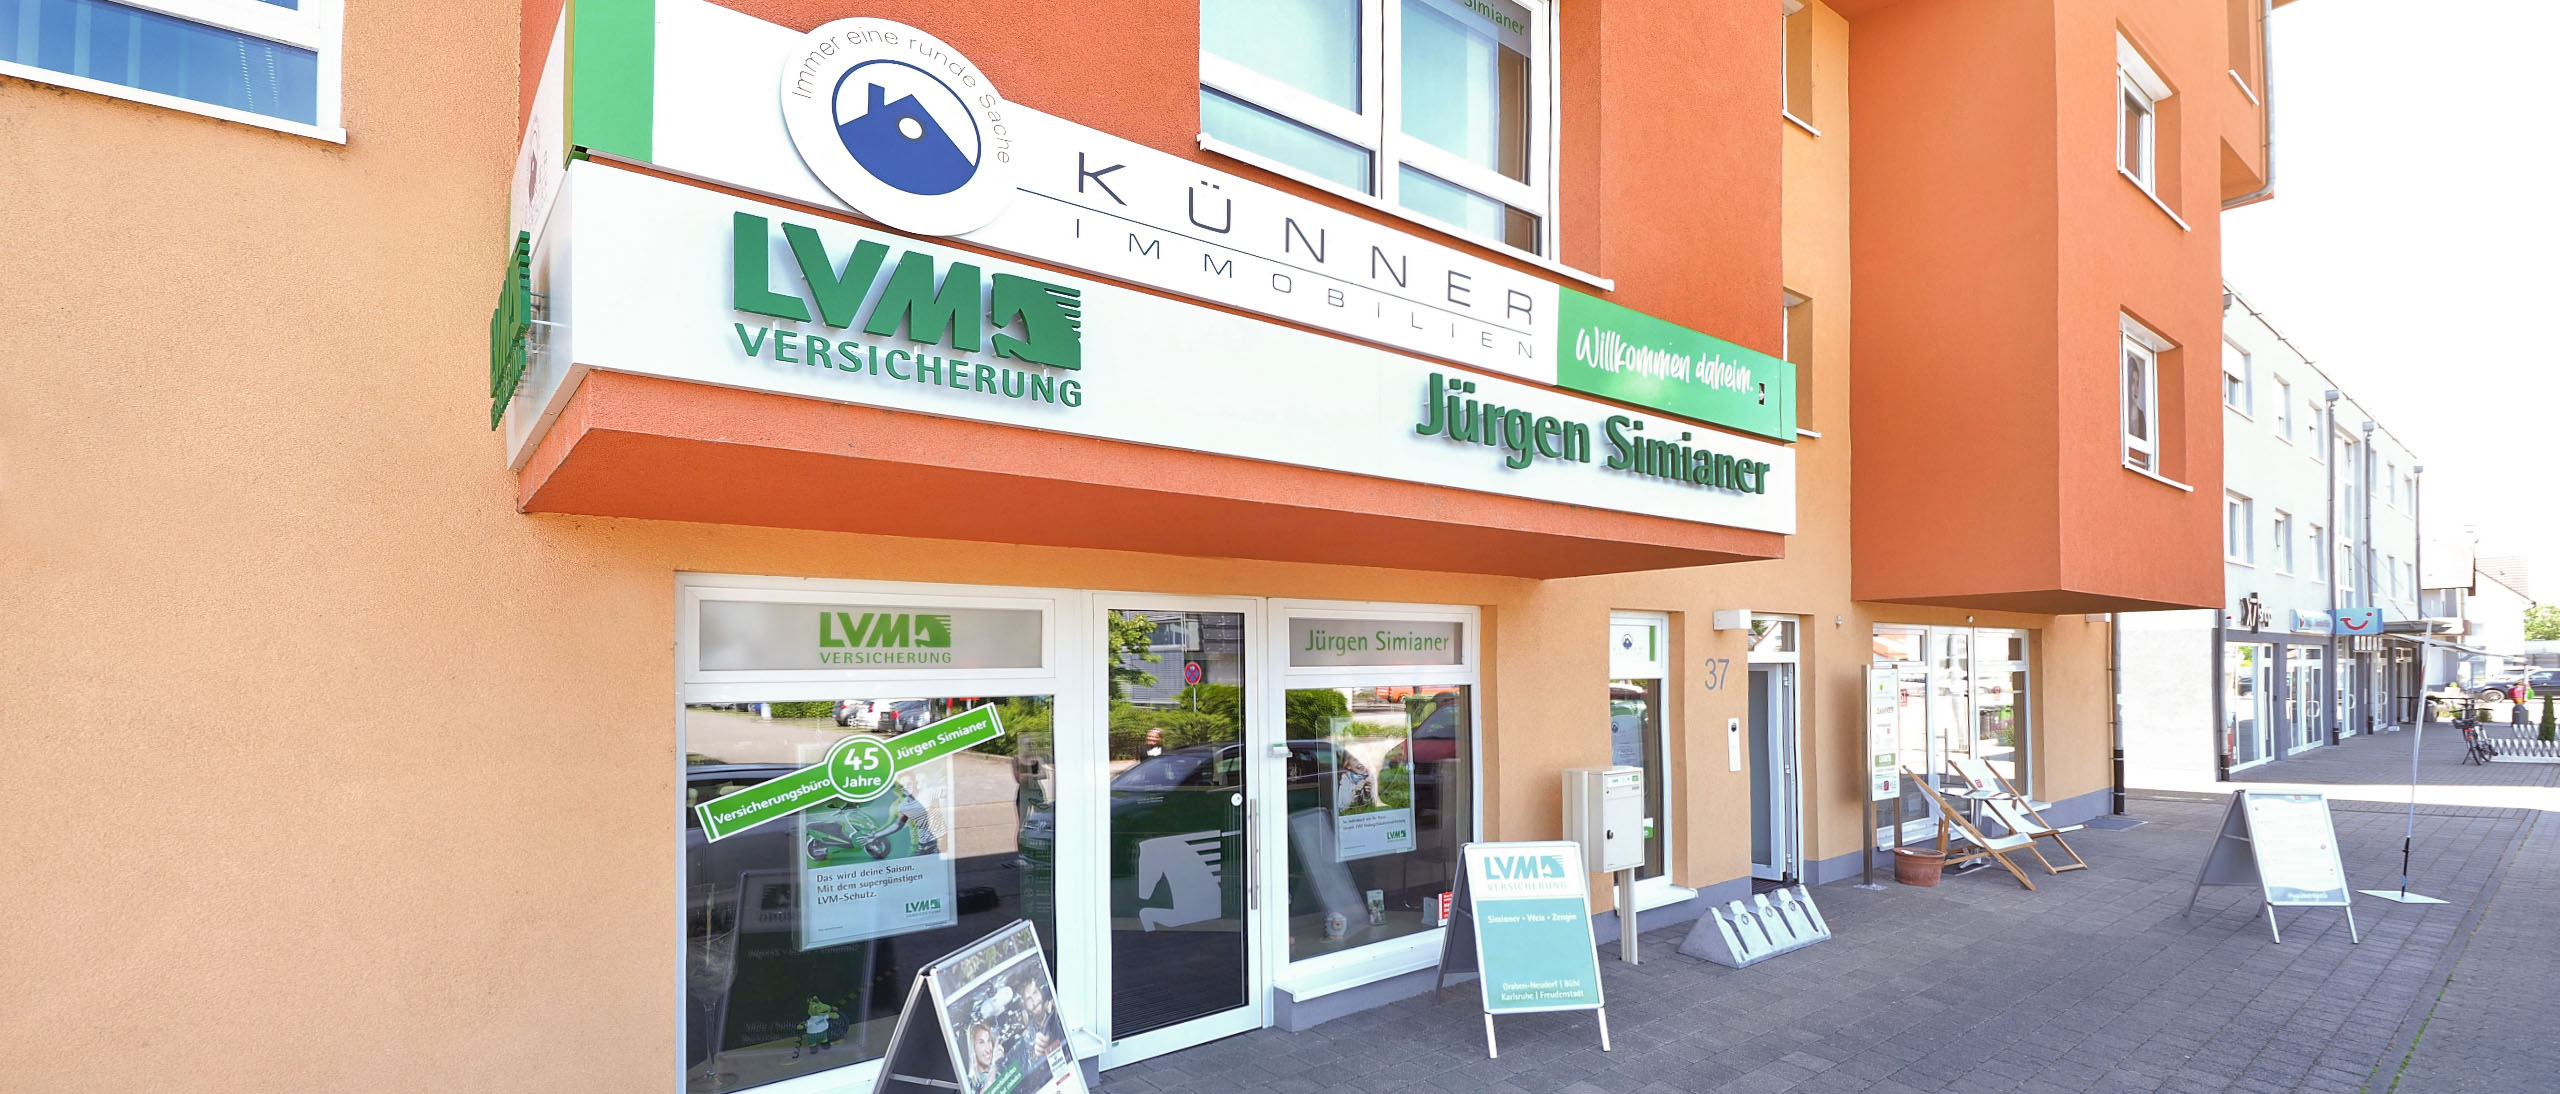 https://kuenner-immobilien.de/wp-content/uploads/2020/06/banner-ueber-uns-2.jpg